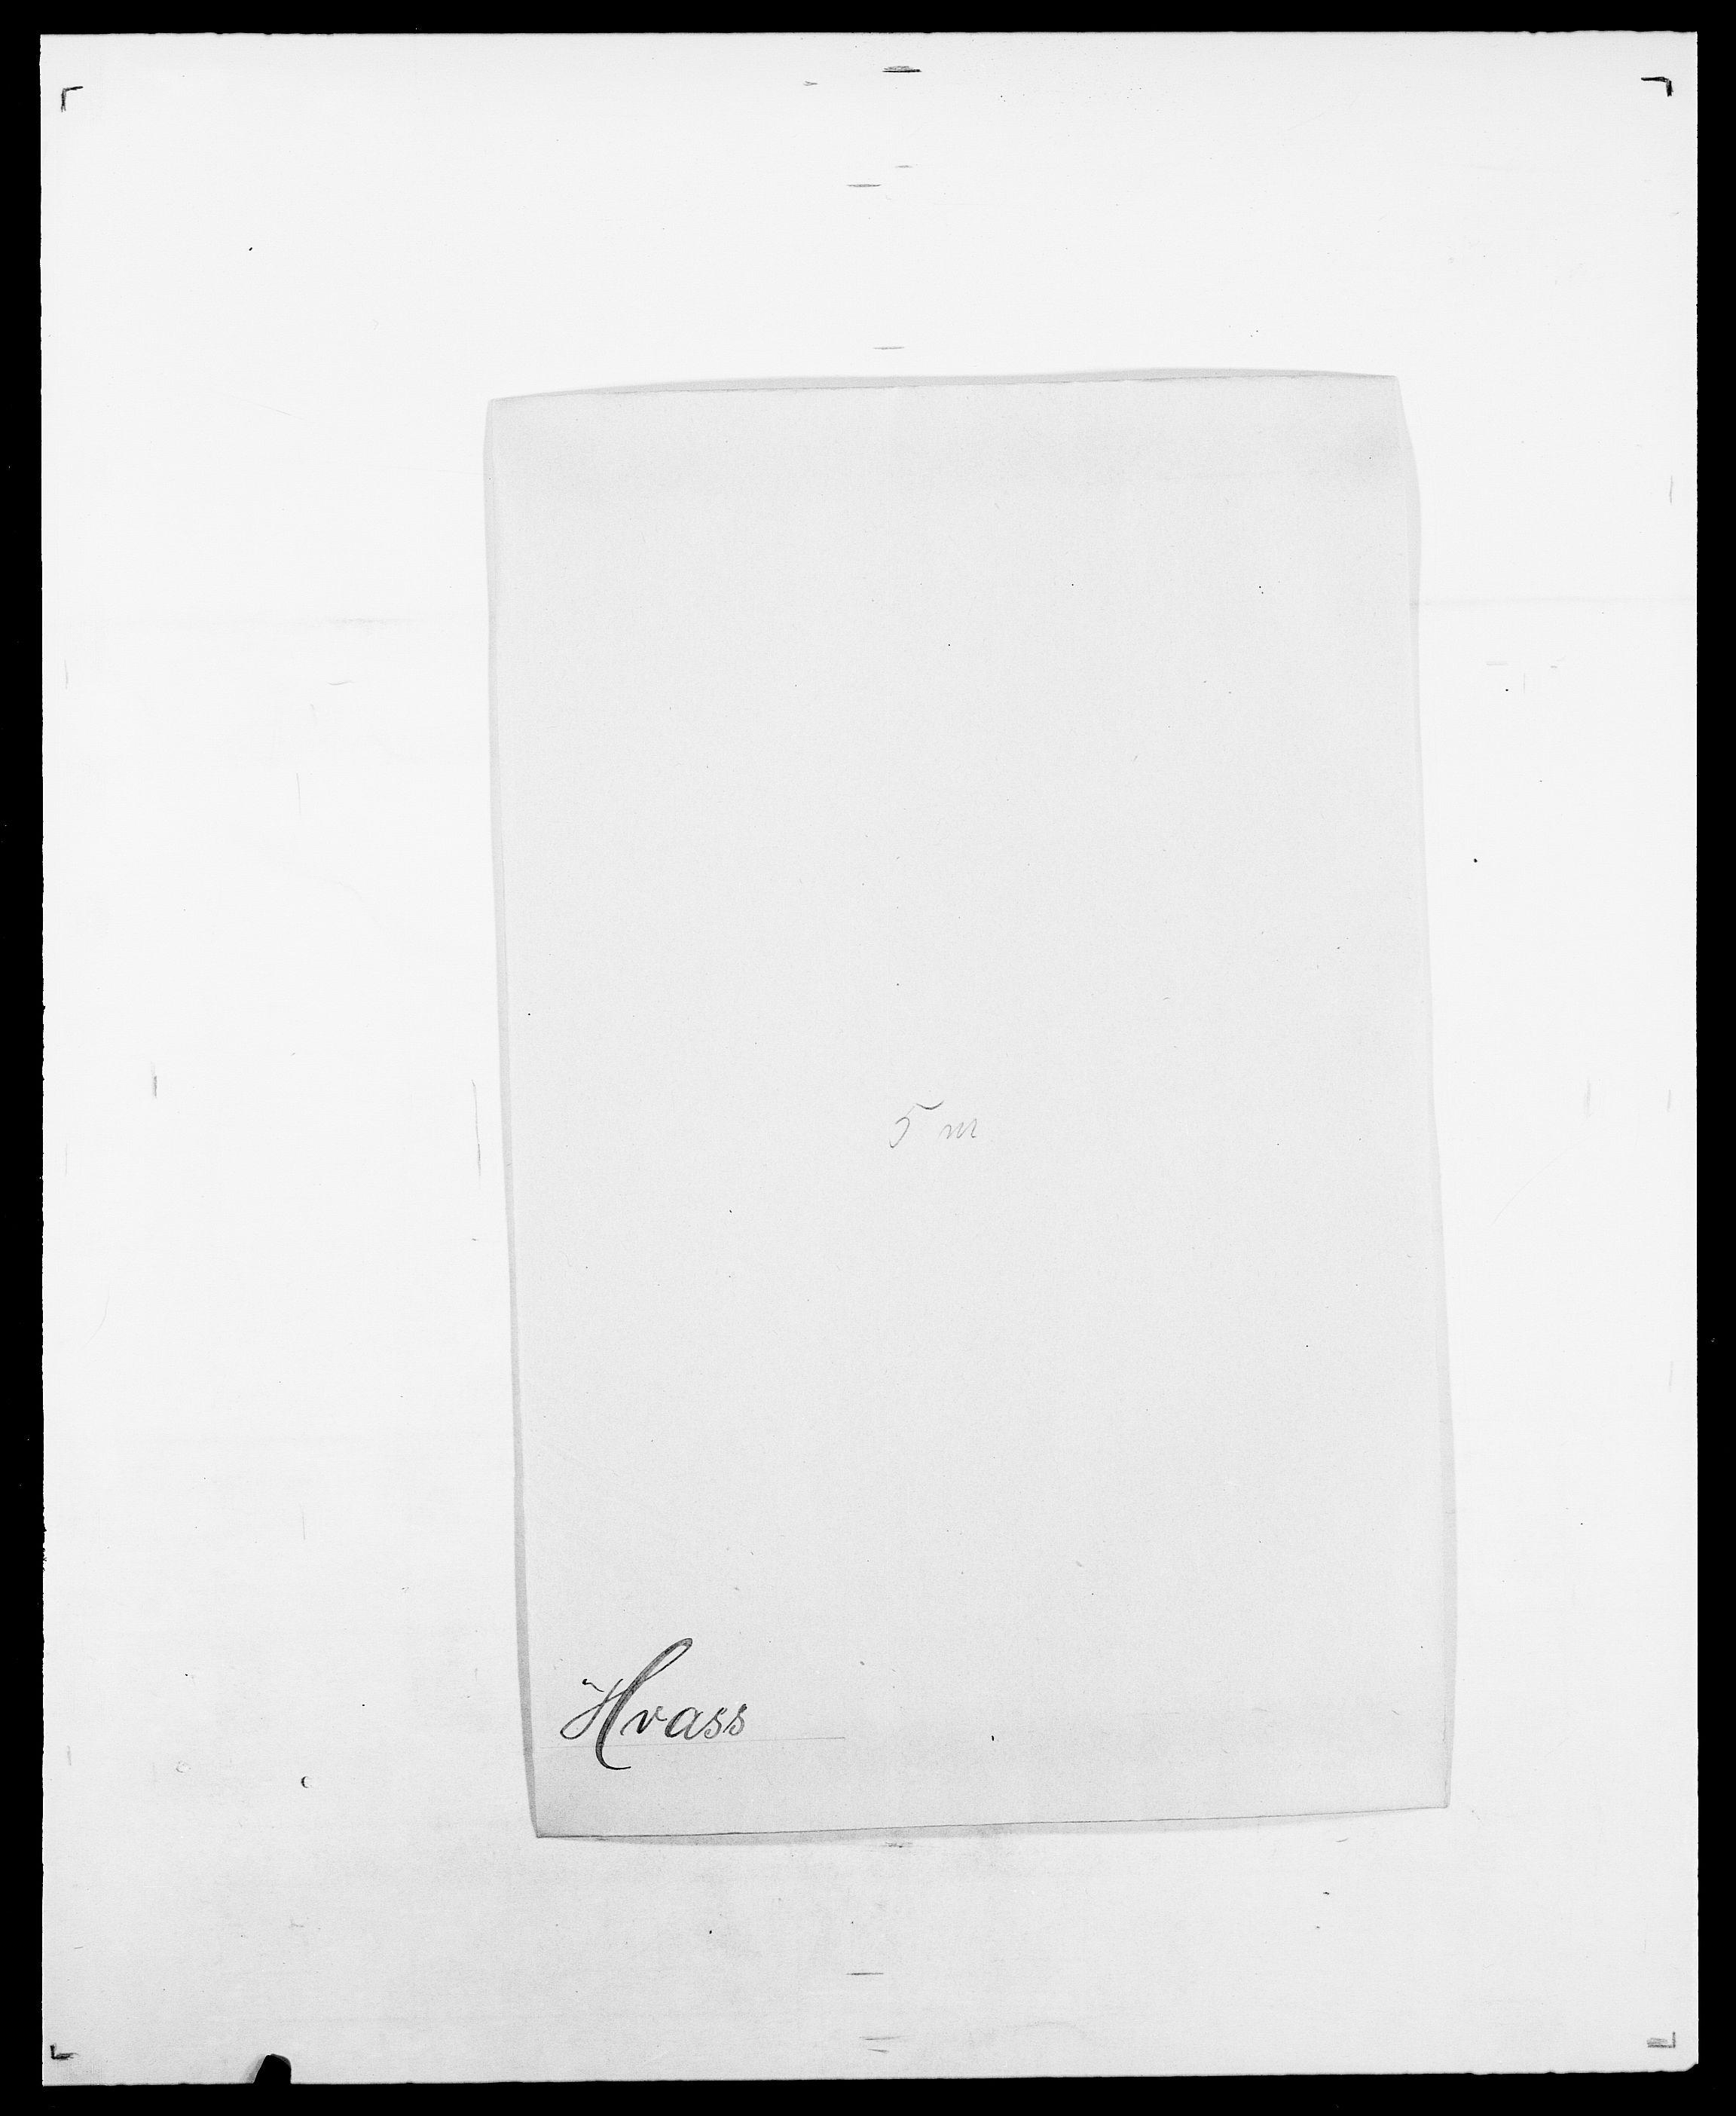 SAO, Delgobe, Charles Antoine - samling, D/Da/L0019: van der Hude - Joys, s. 123